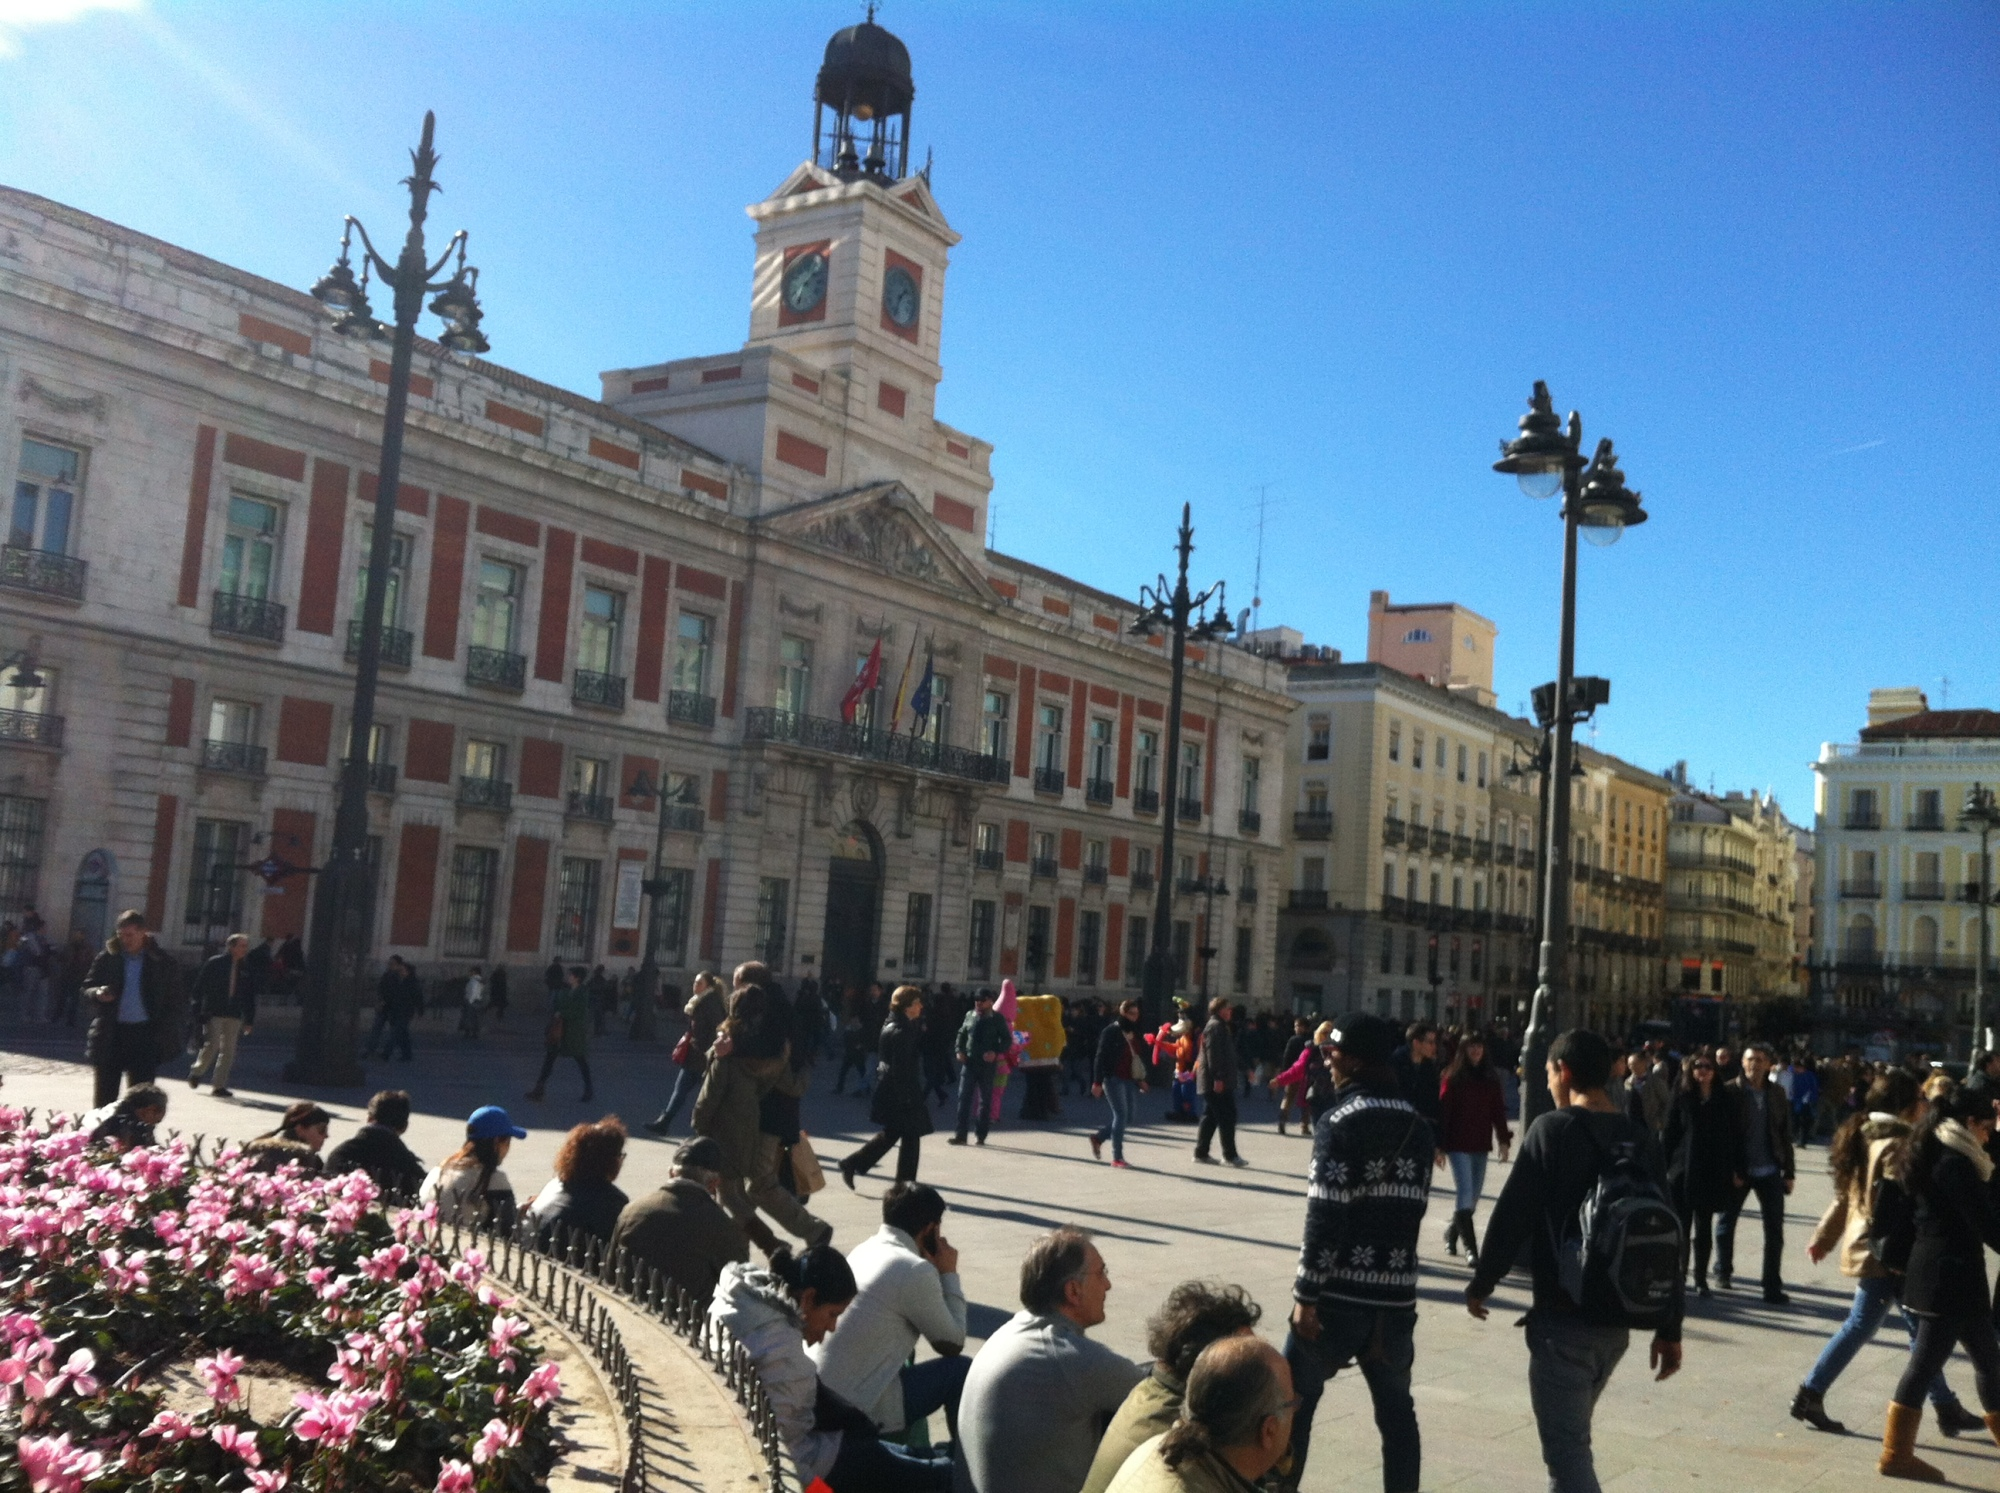 puertas del sol, madrid, vodafone sol, spain, european capitals, places to visit in europe